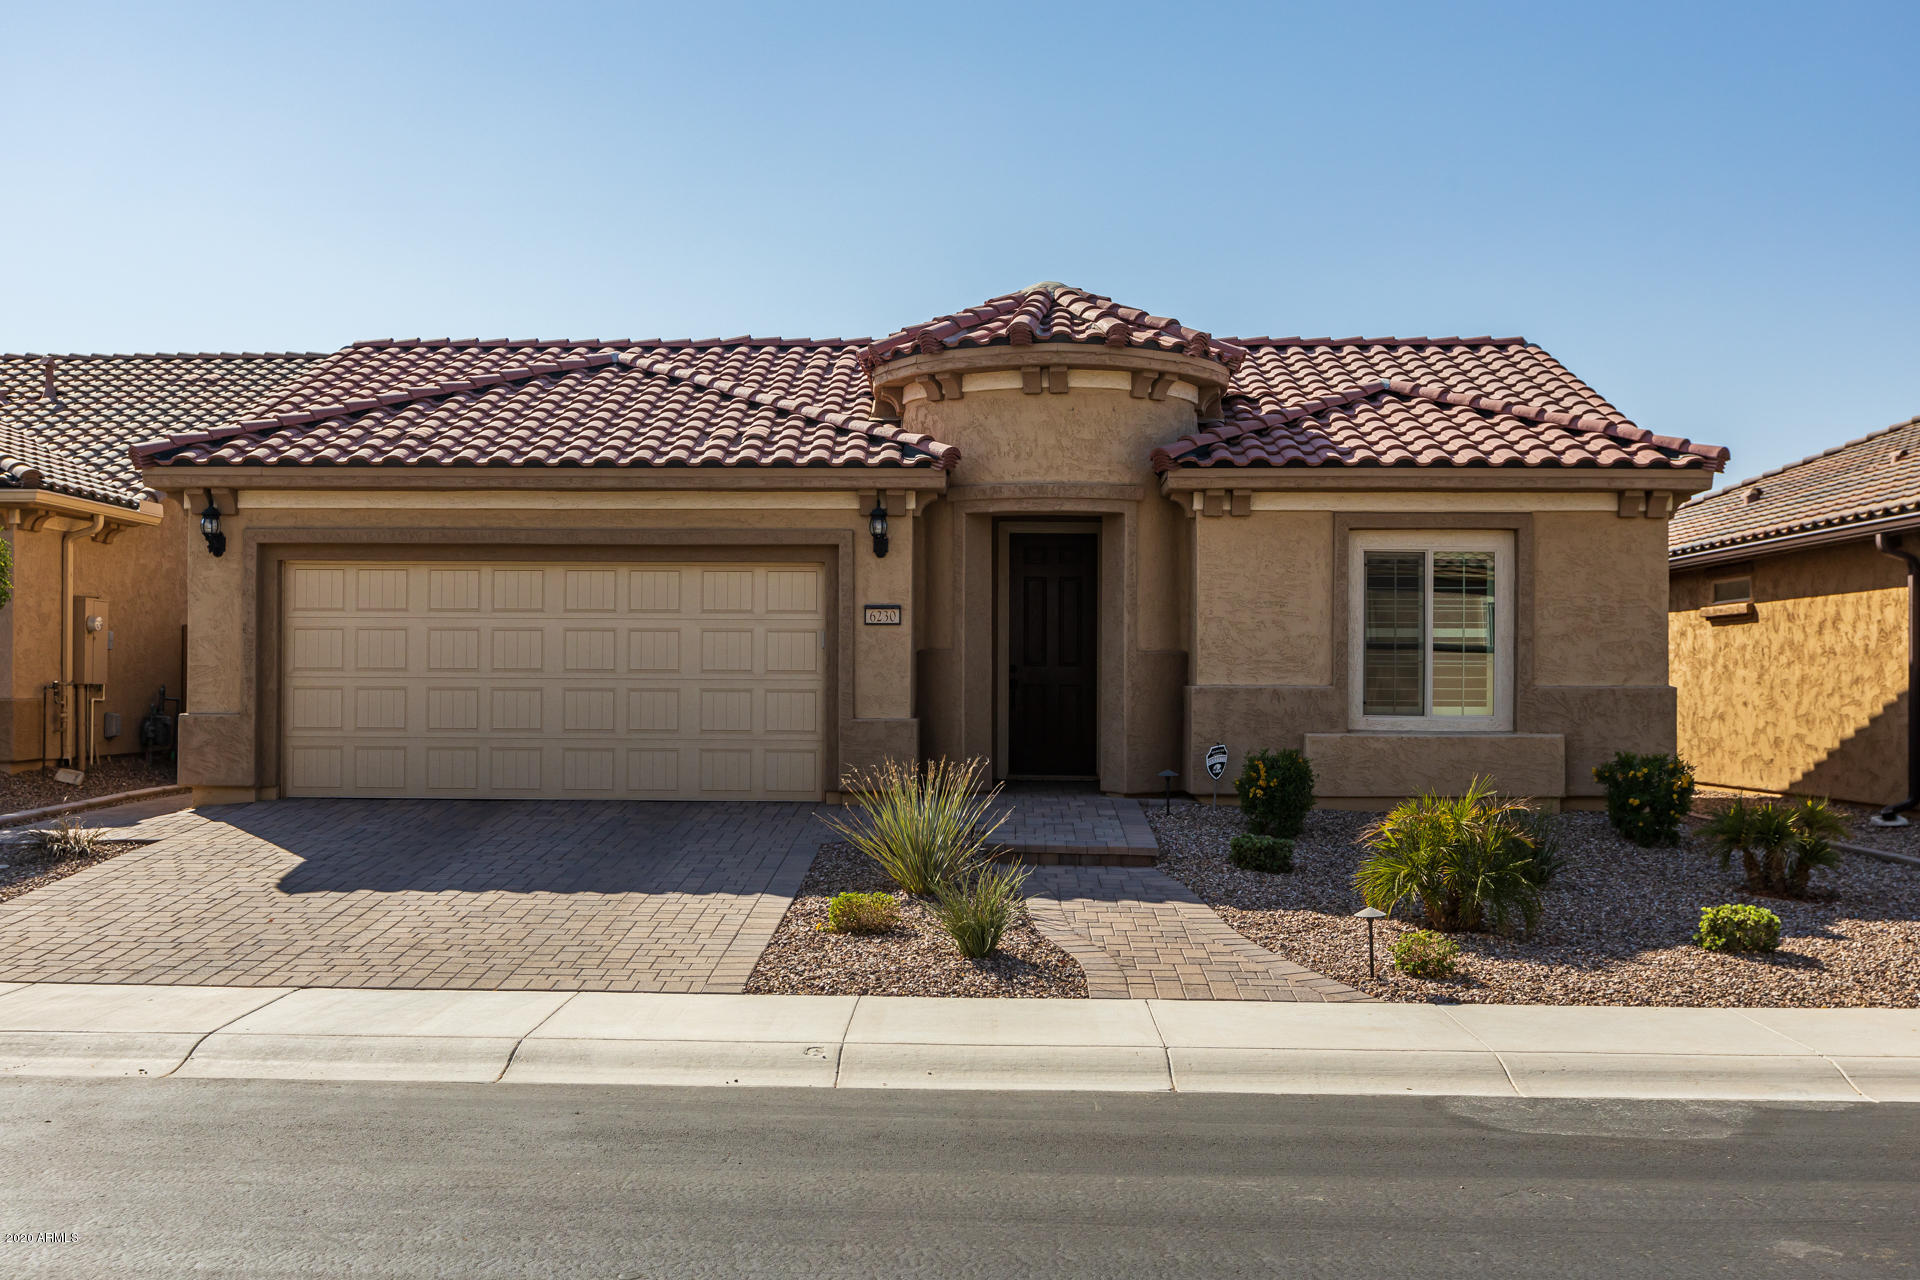 MLS 6143765 6230 S PINALENO Place, Chandler, AZ 85249 Chandler AZ Adult Community